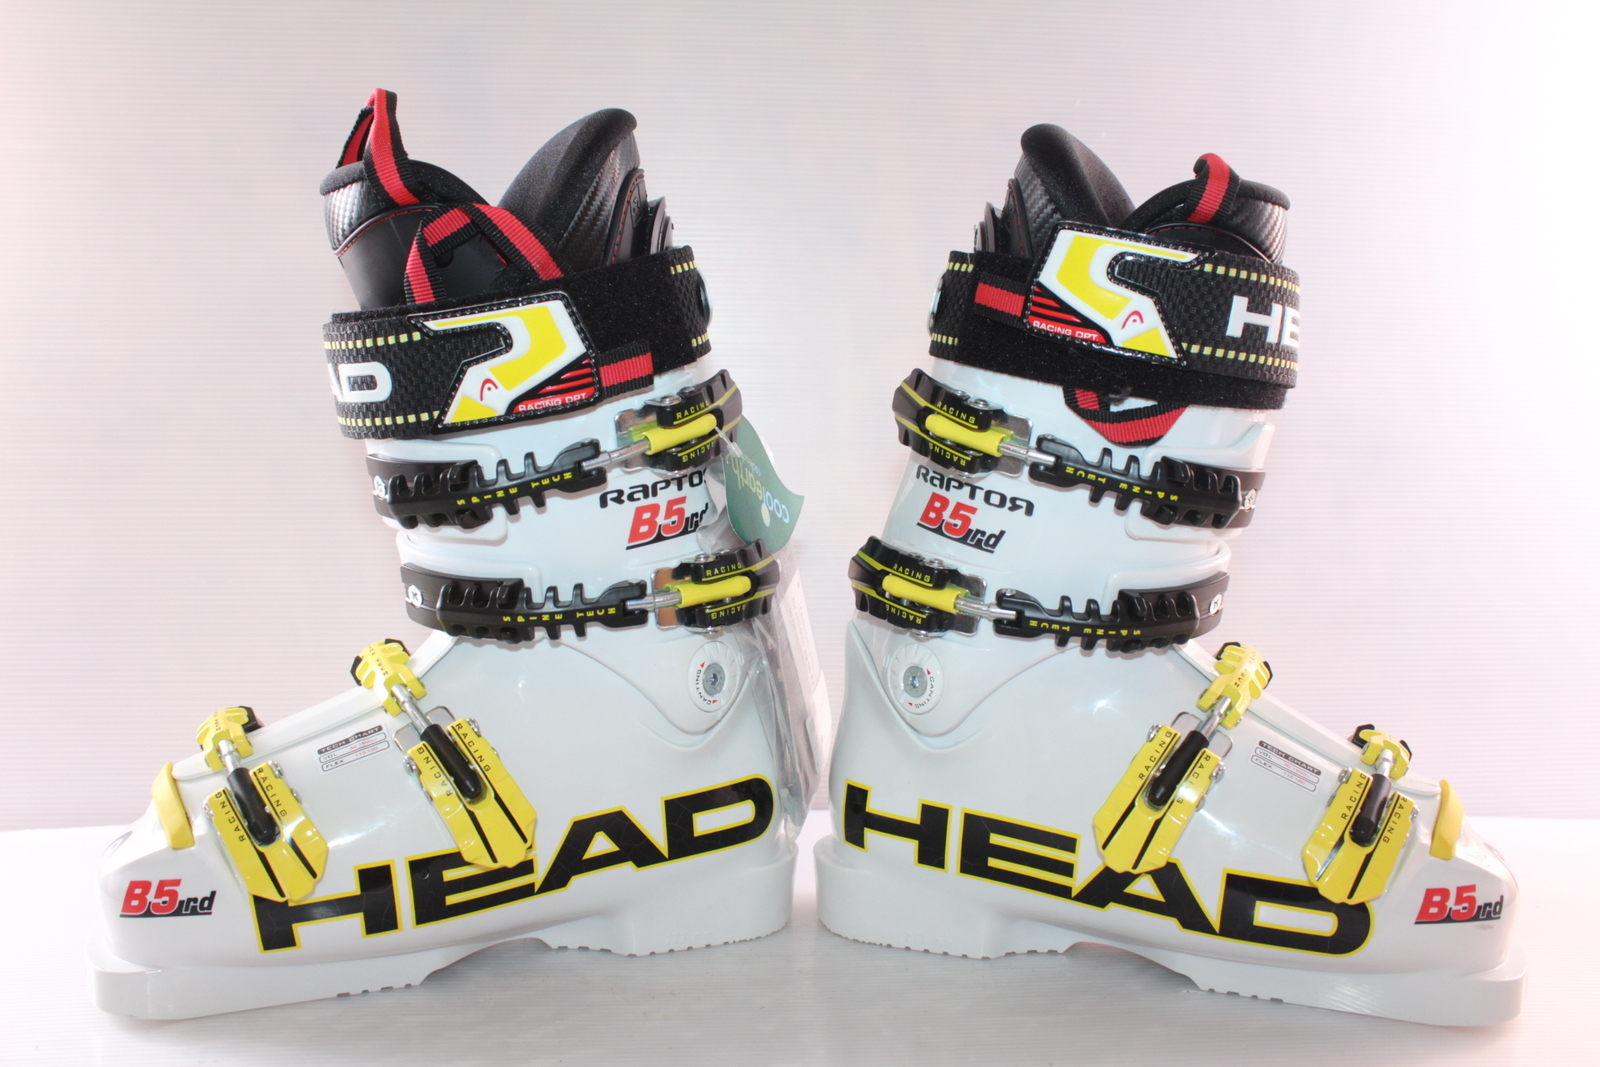 Lyžařské boty Head Raptor B5 rd vel. EU37 flexe 110